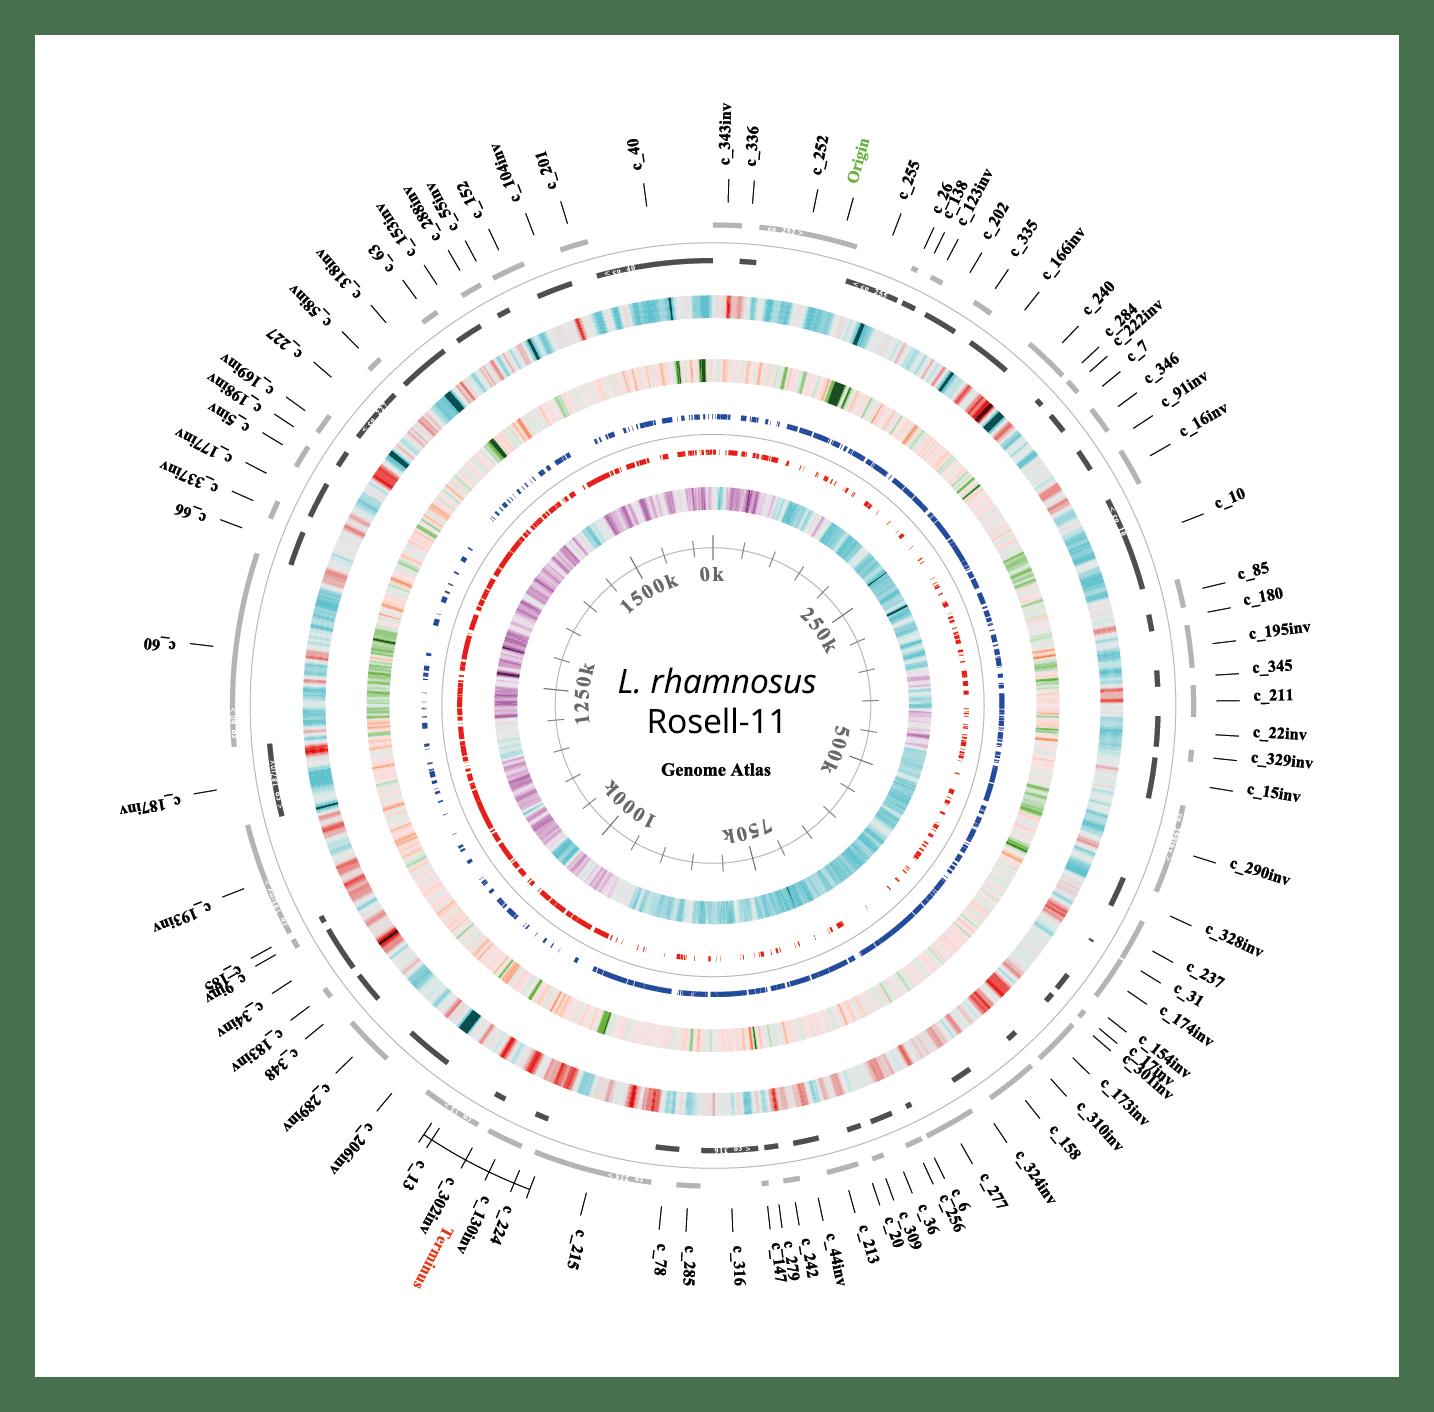 L. rhamnosusRosell-11: Genome Atlas